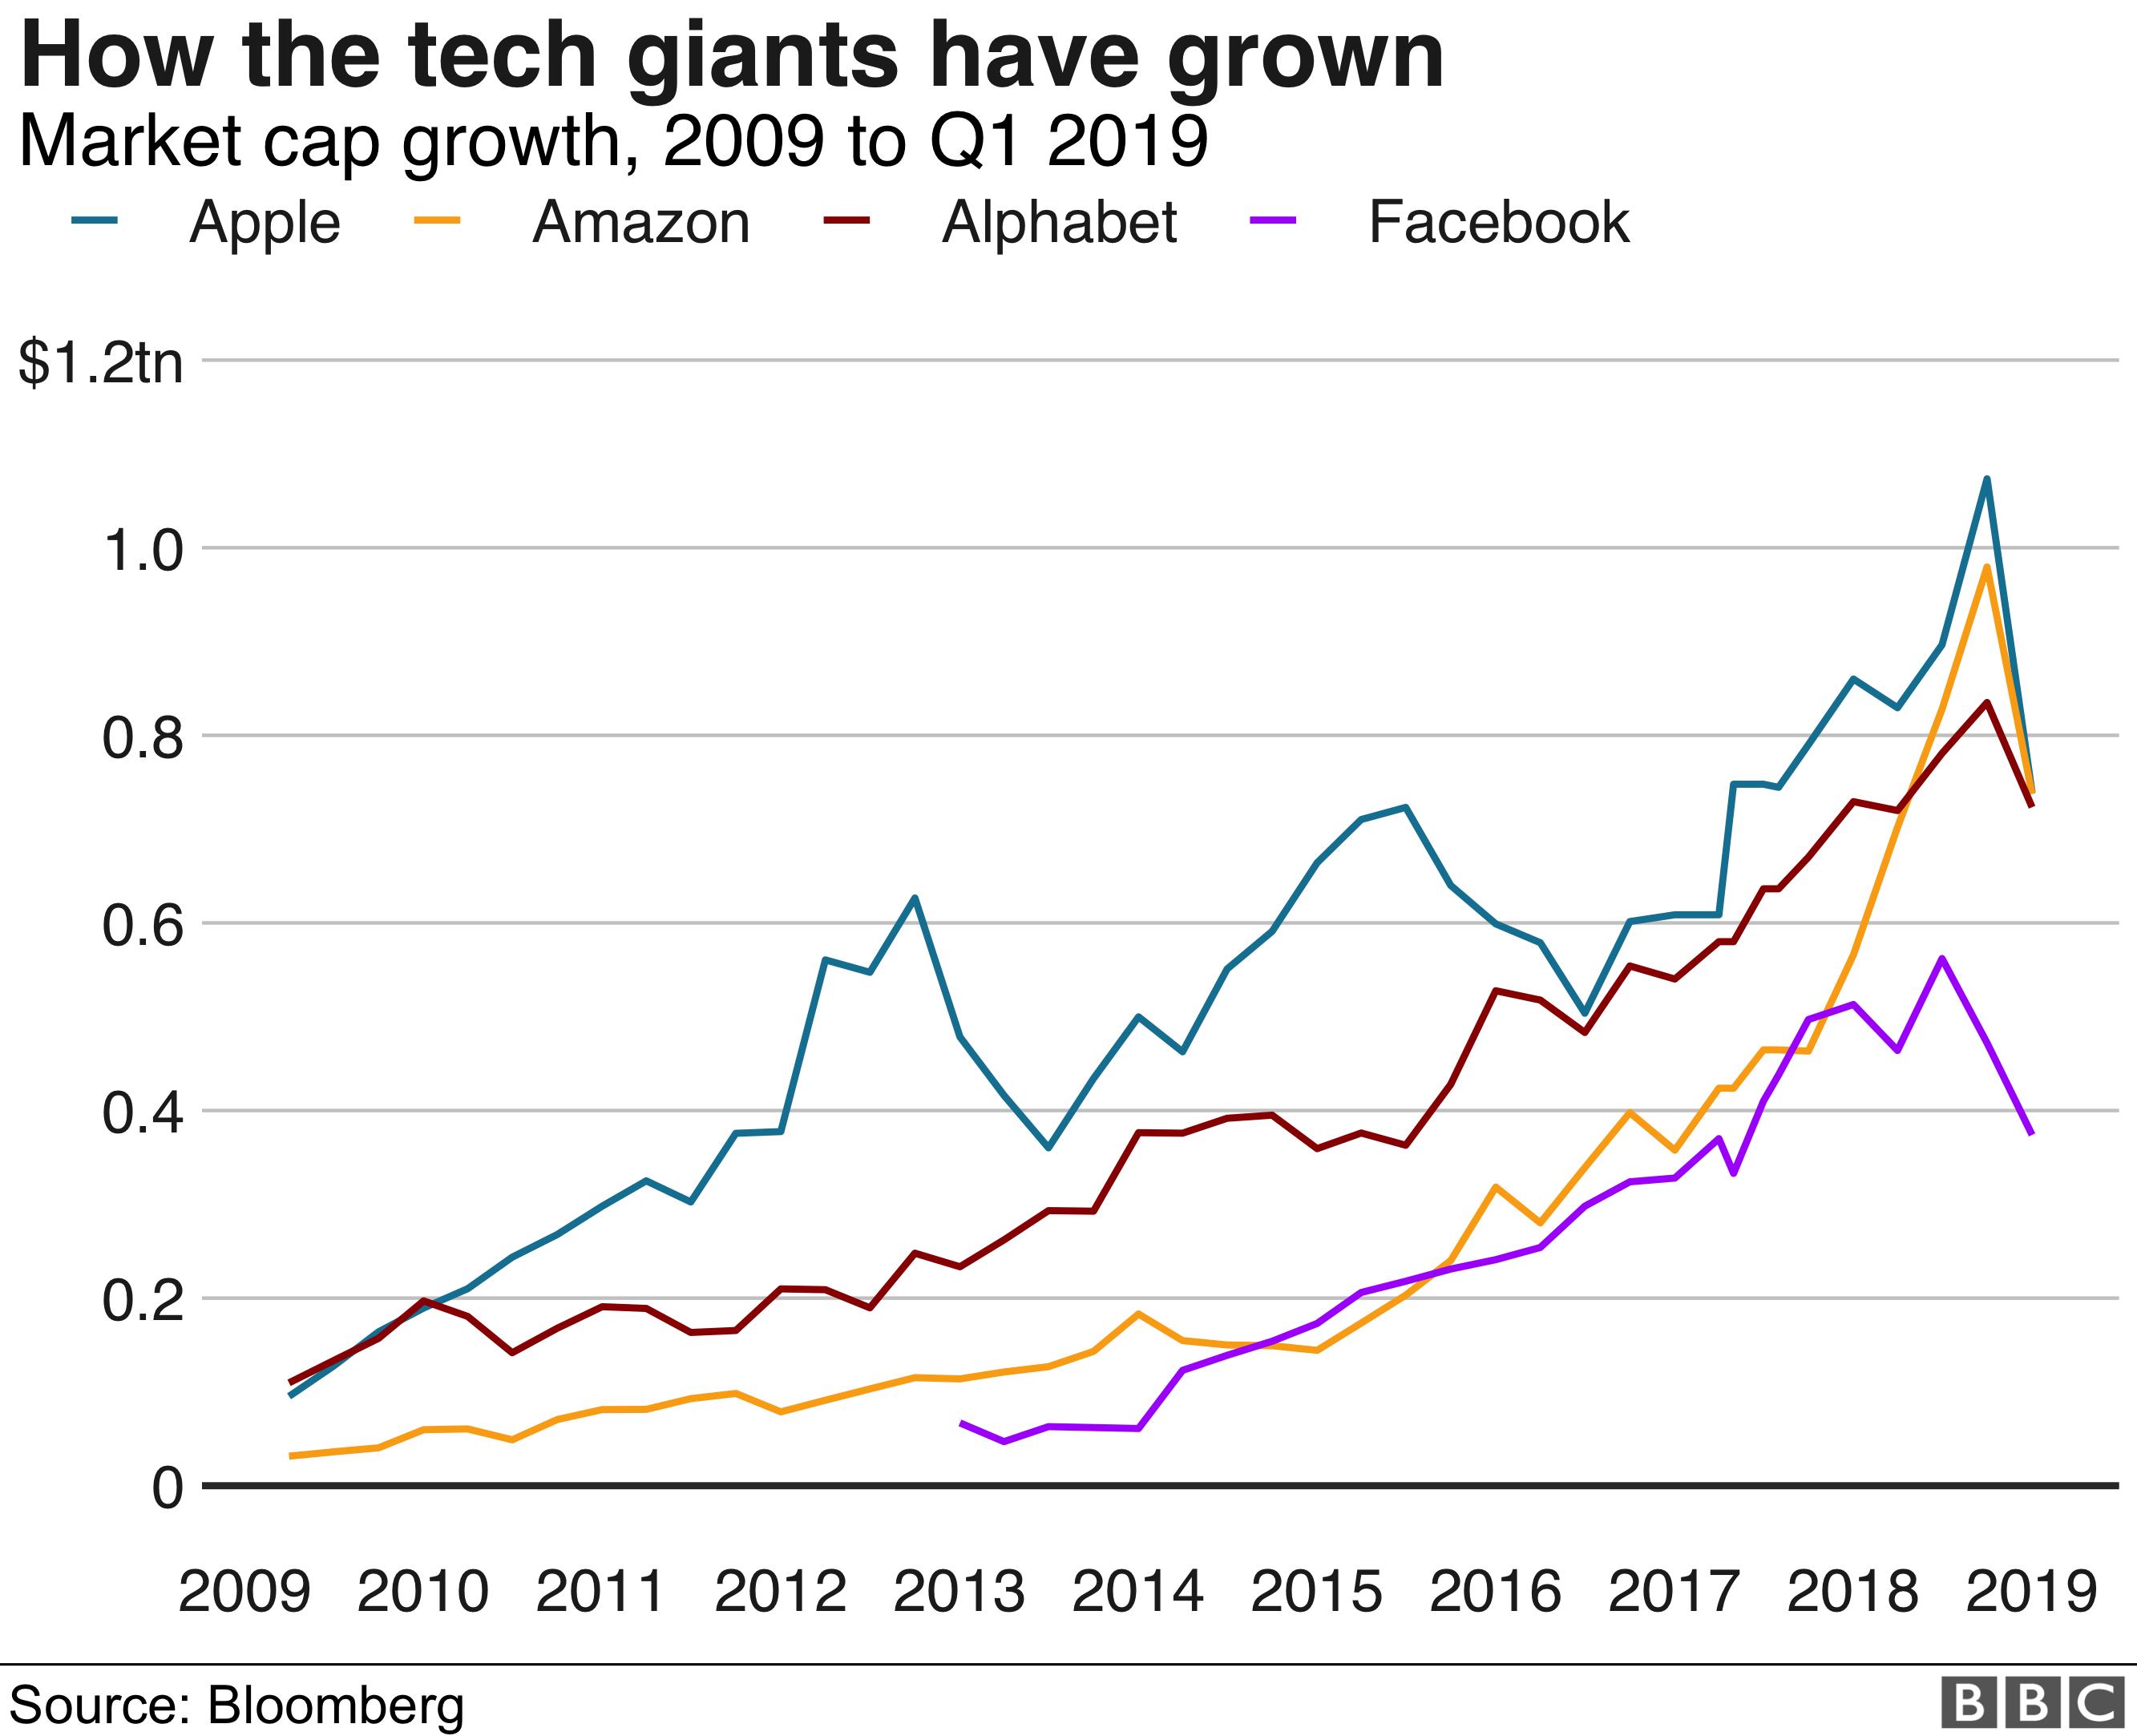 Chart showing market cap growth of Amazon, Google, Apple, Facebook